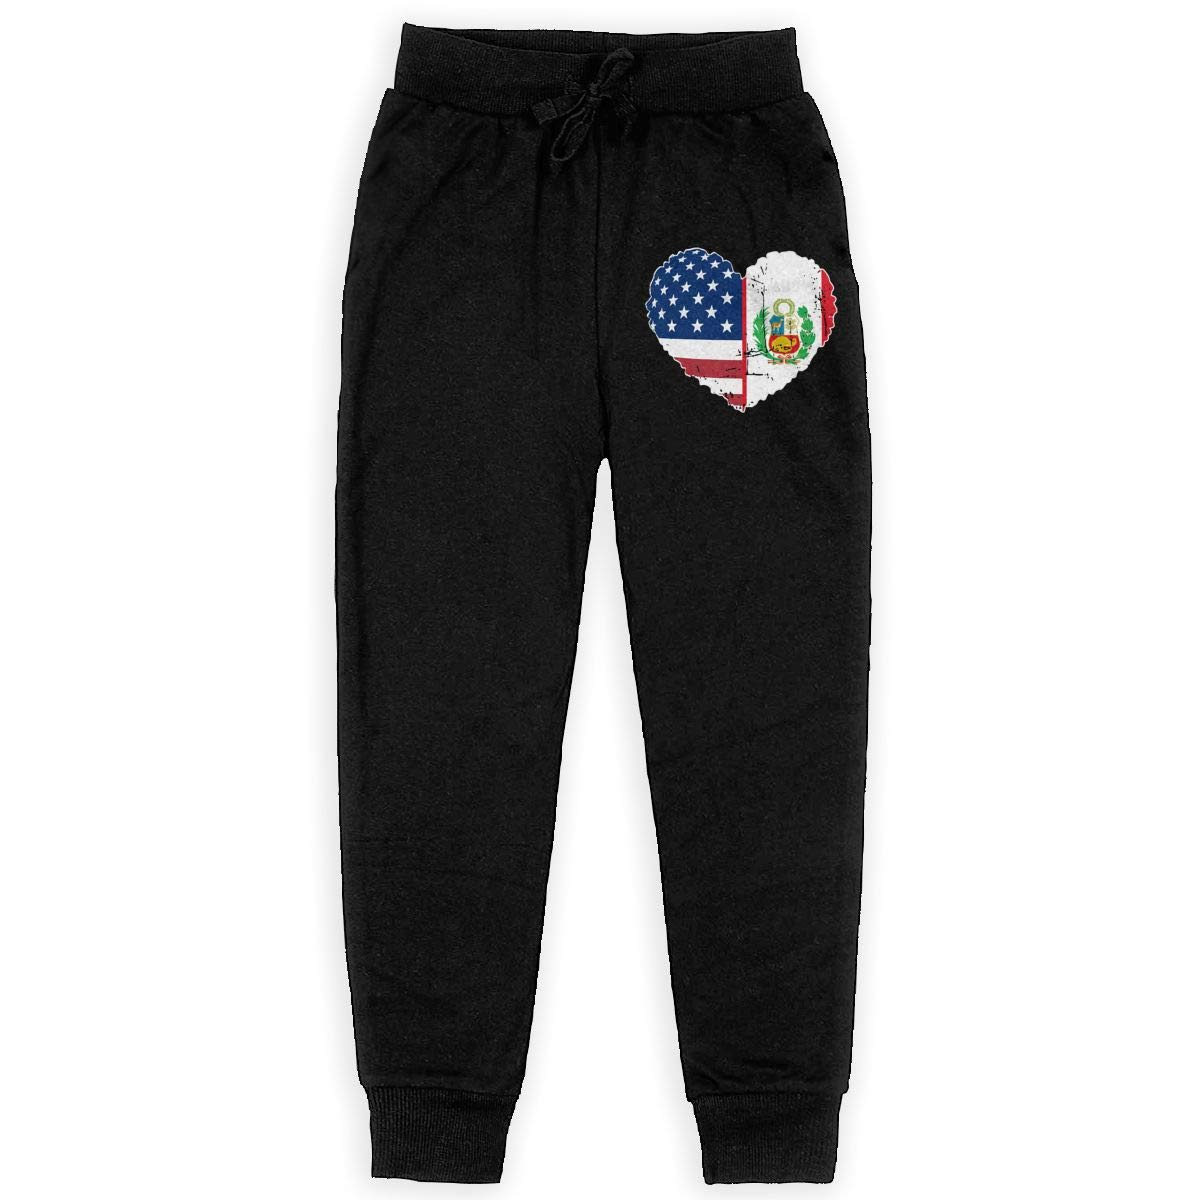 Teenager Athletic Pants for Teen Boy WYZVK22 Peru USA Flag Heart Soft//Cozy Sweatpants